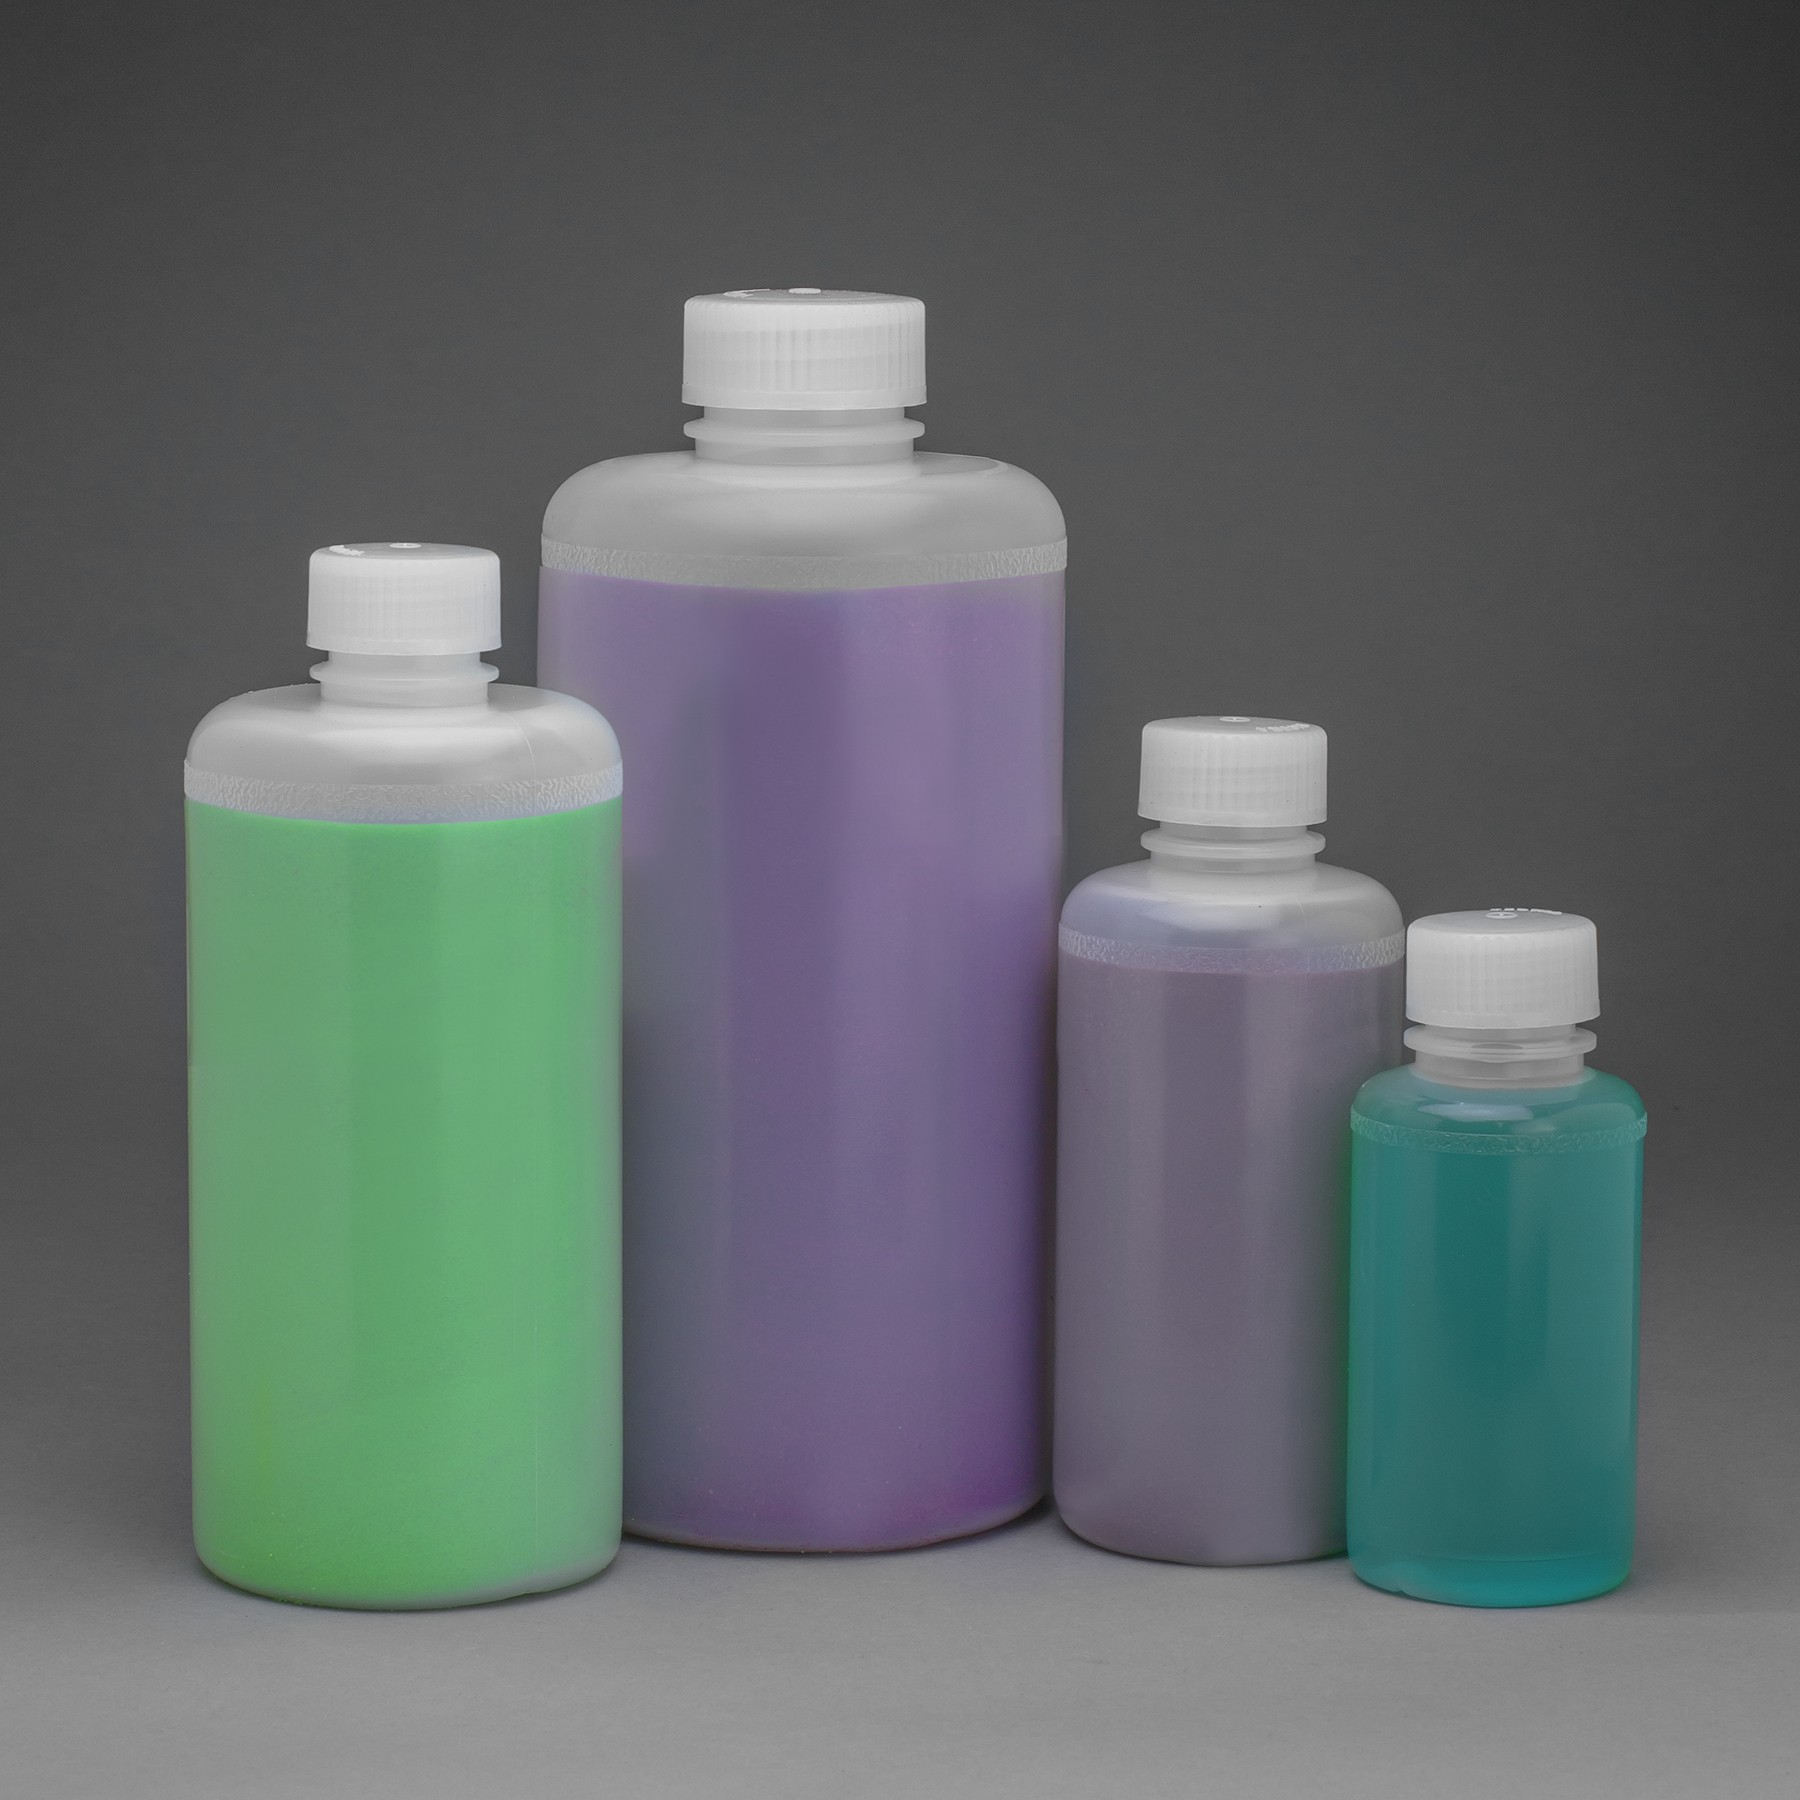 38mm Closure Pack of 6 Bel-Art Precisionware Narrow-Mouth 1000ml 32oz F10620-0008 High-Density Polyethylene Bottles; Polypropylene Cap